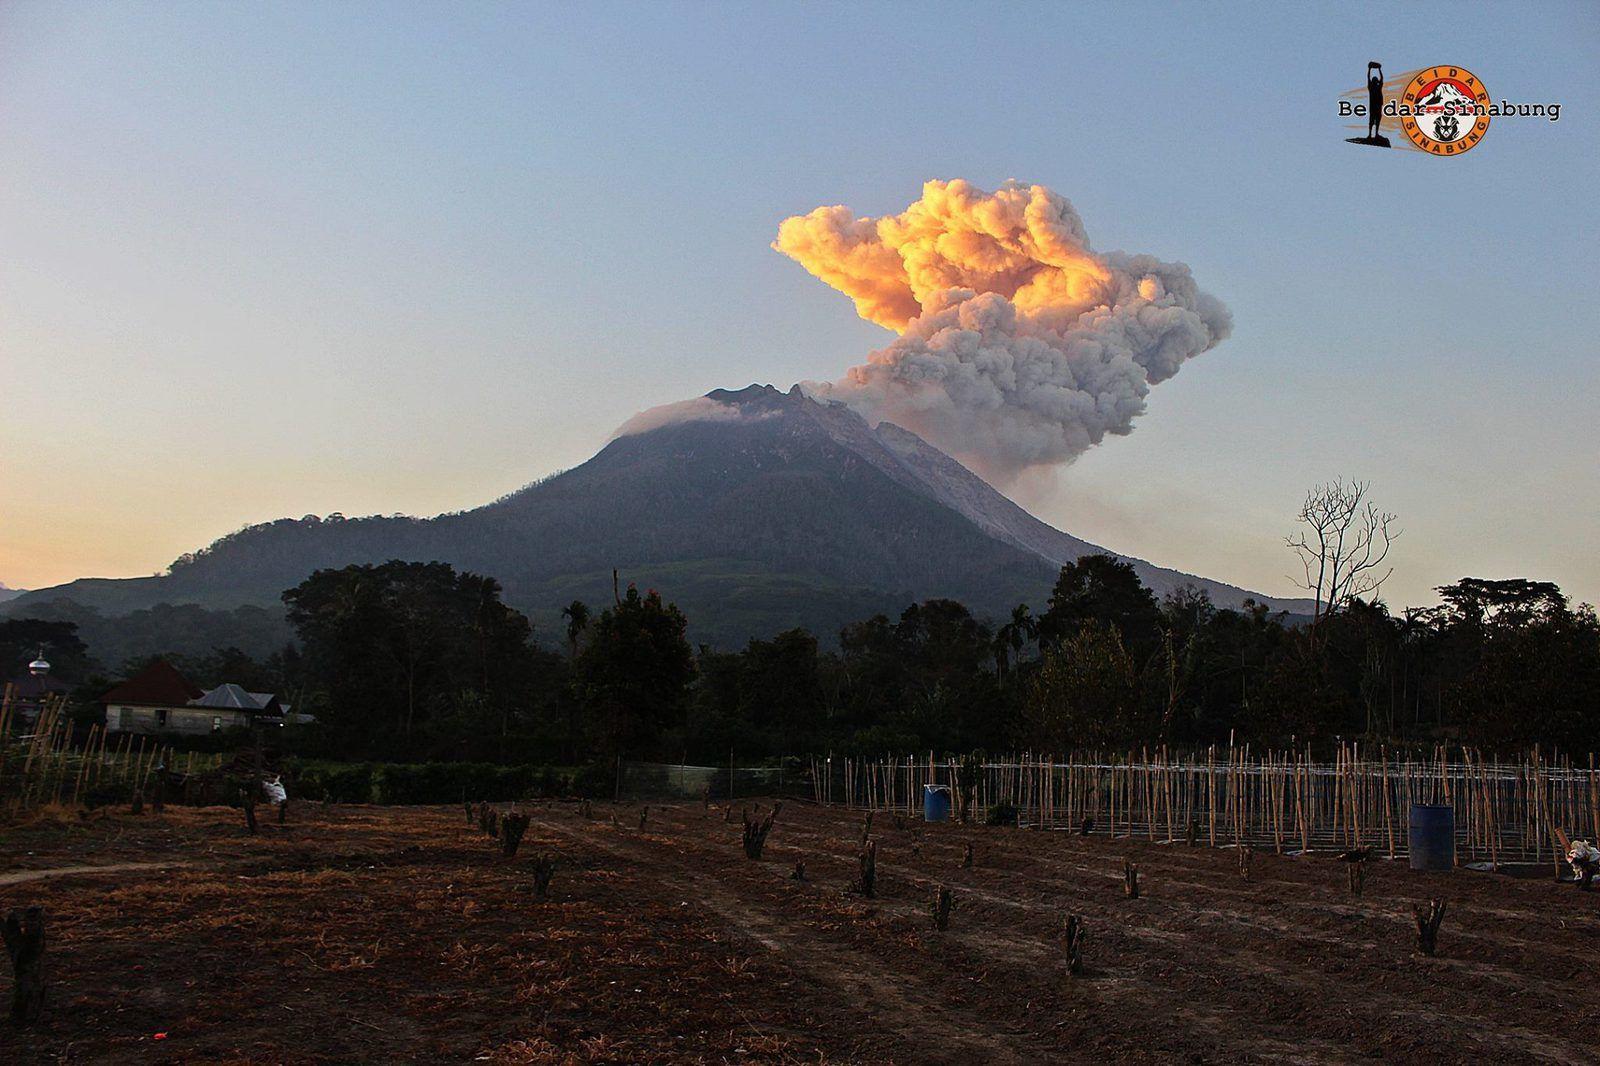 Sinabung -  03.07.2016 / 18h29 - photo Firdaus Surbakti via Beidar Sinabung